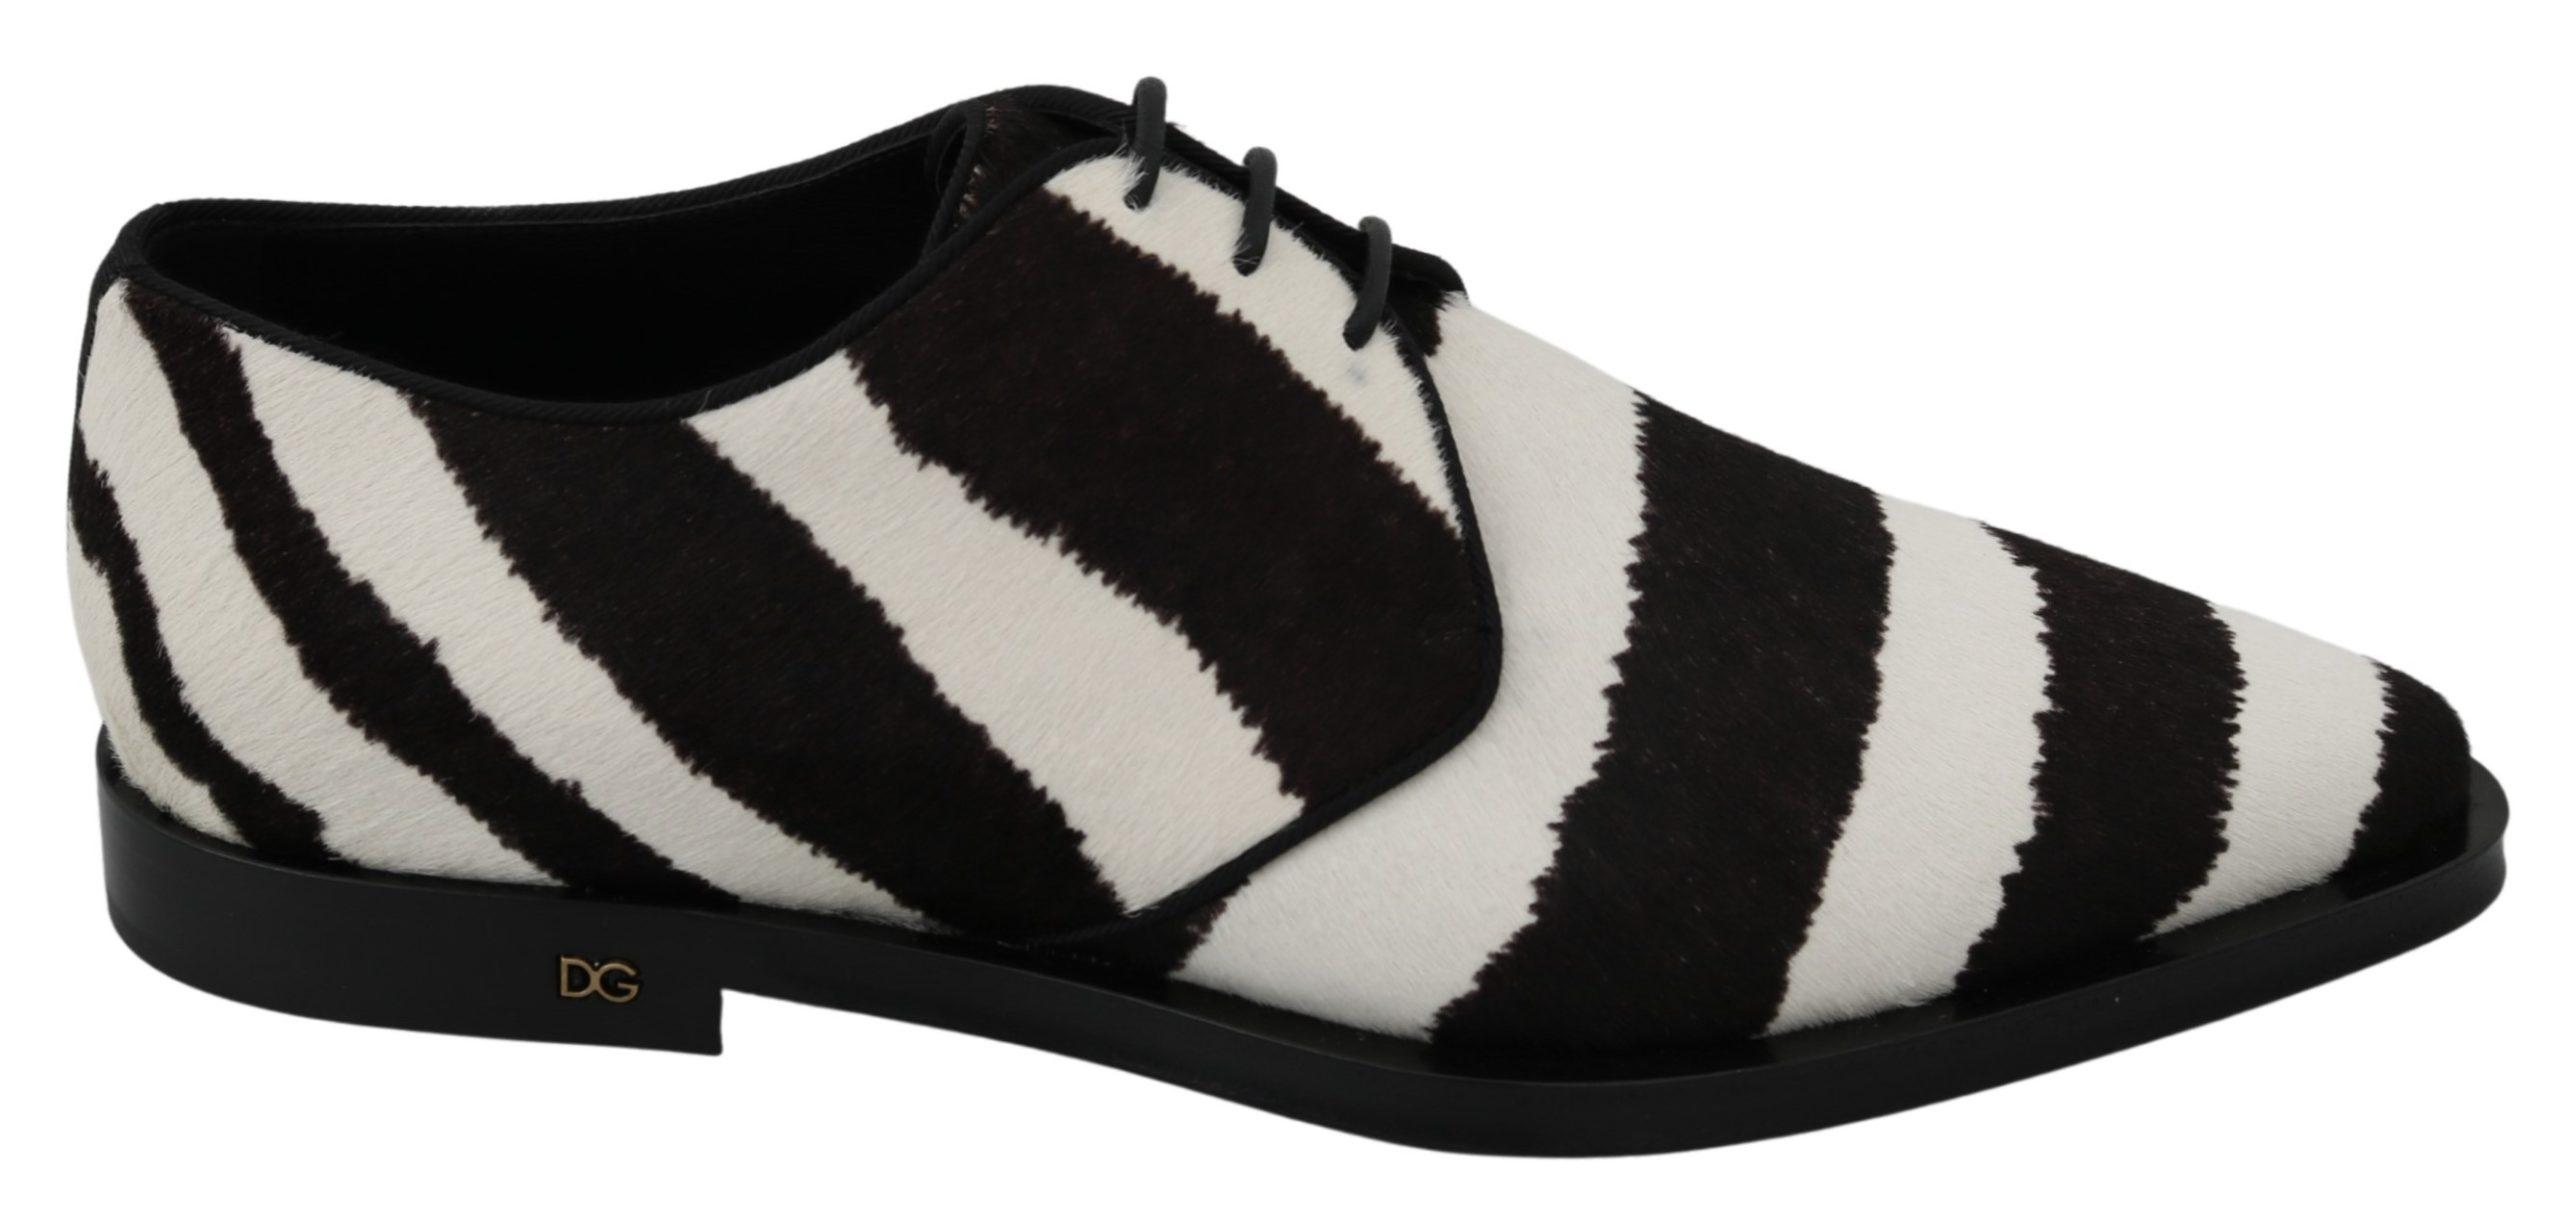 Dolce & Gabbana Women's Zebra Pony Hair Dress Broque Shoe White LA7215 - EU39/US8.5